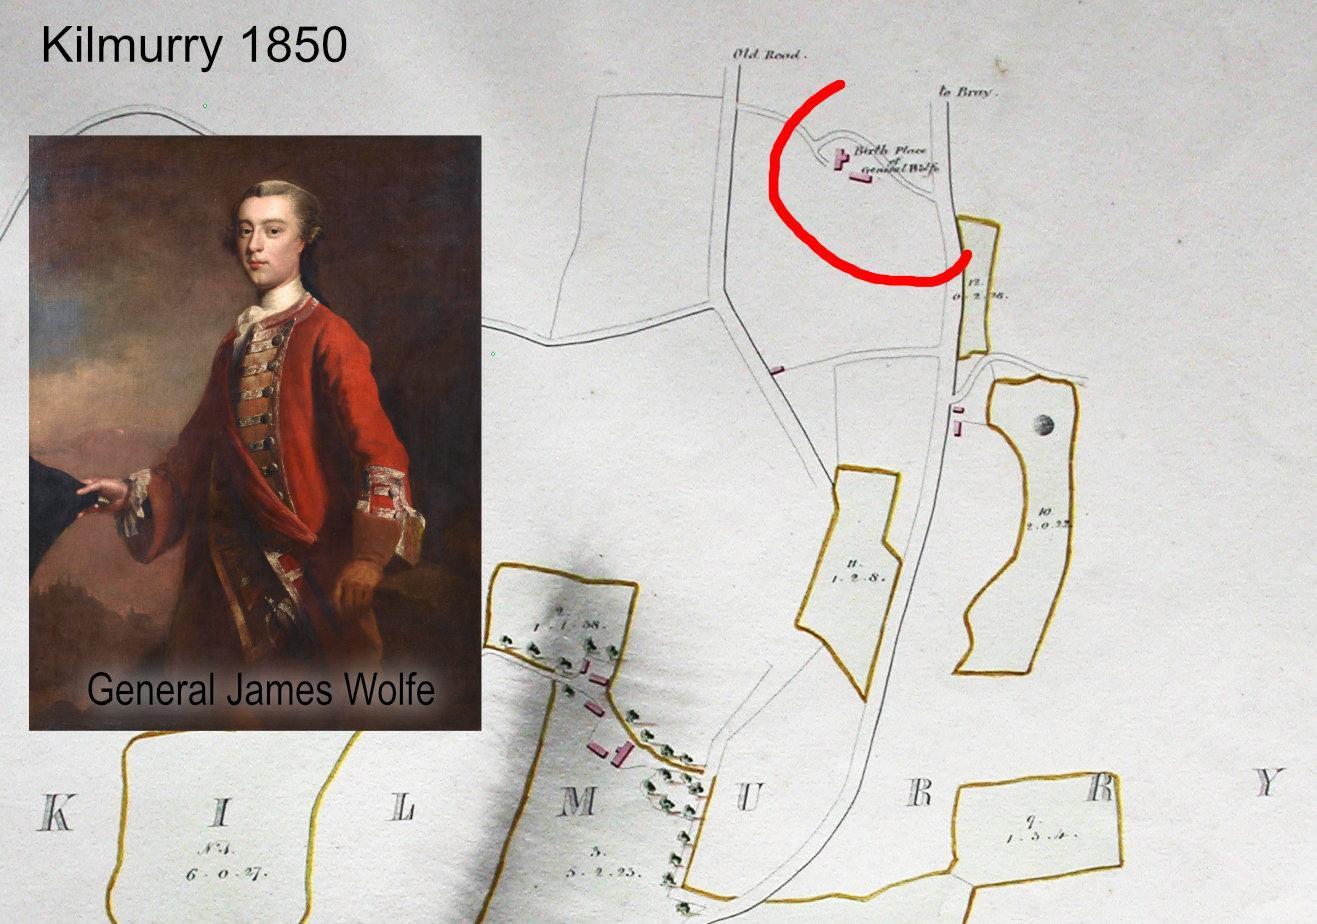 General Wolfe